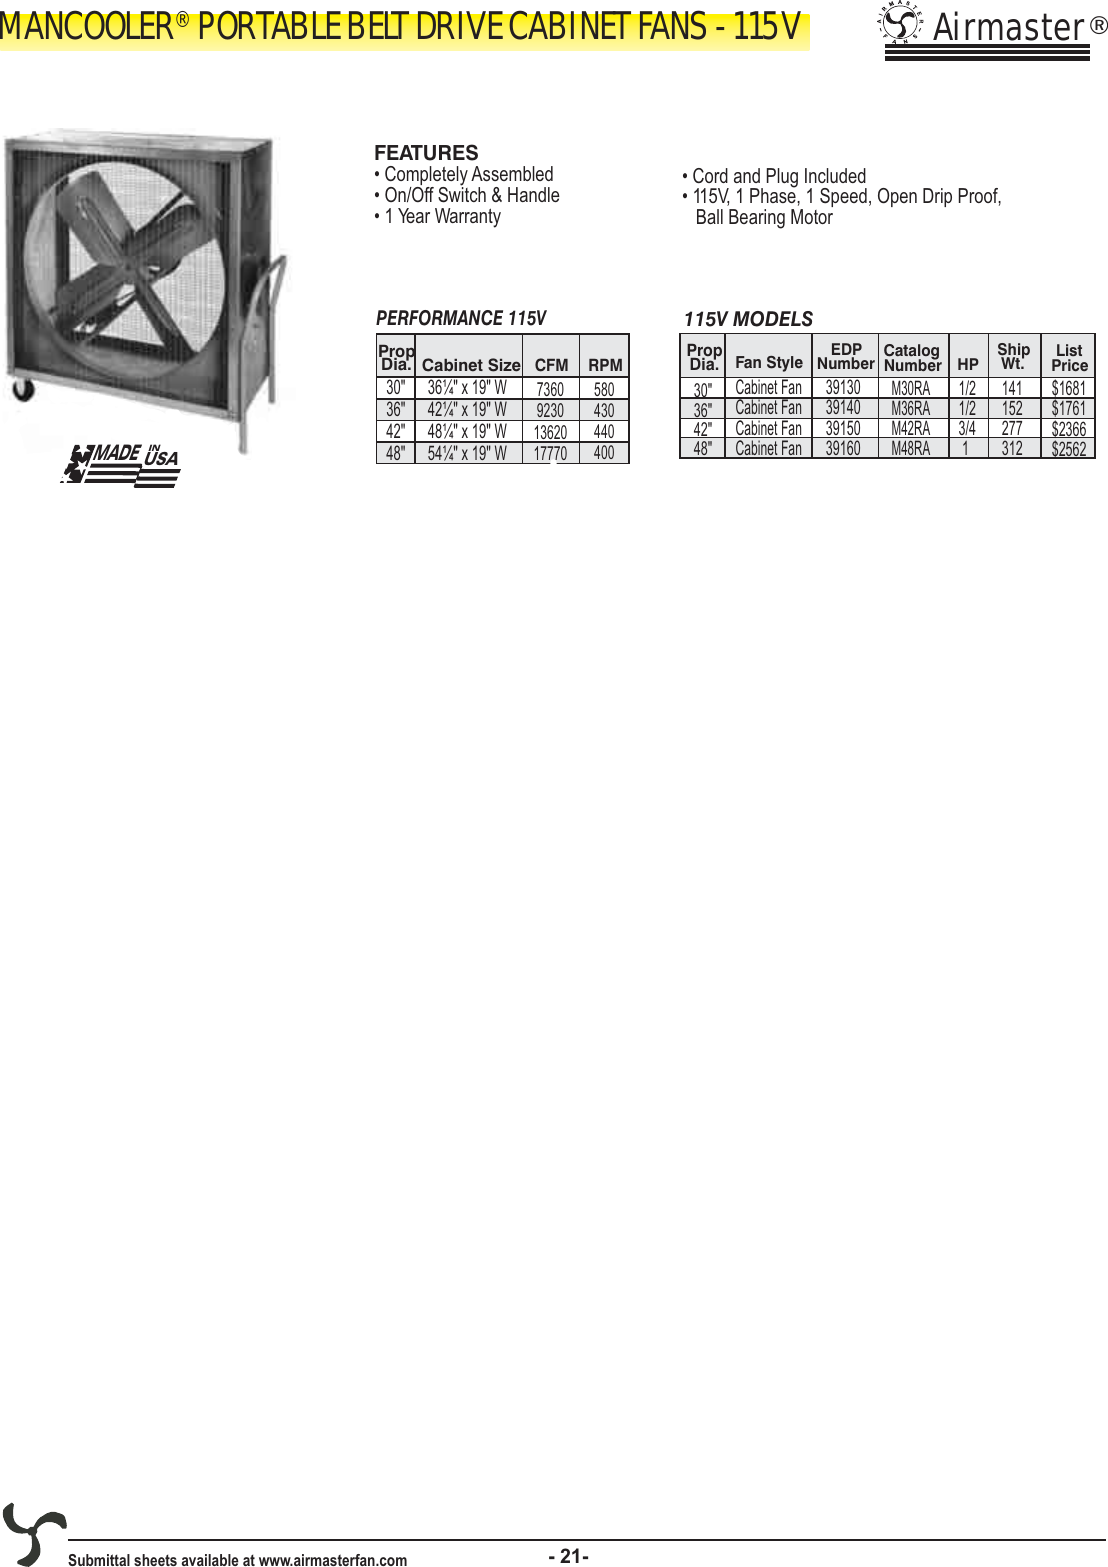 2008 Airmaster Catalog 101711 1